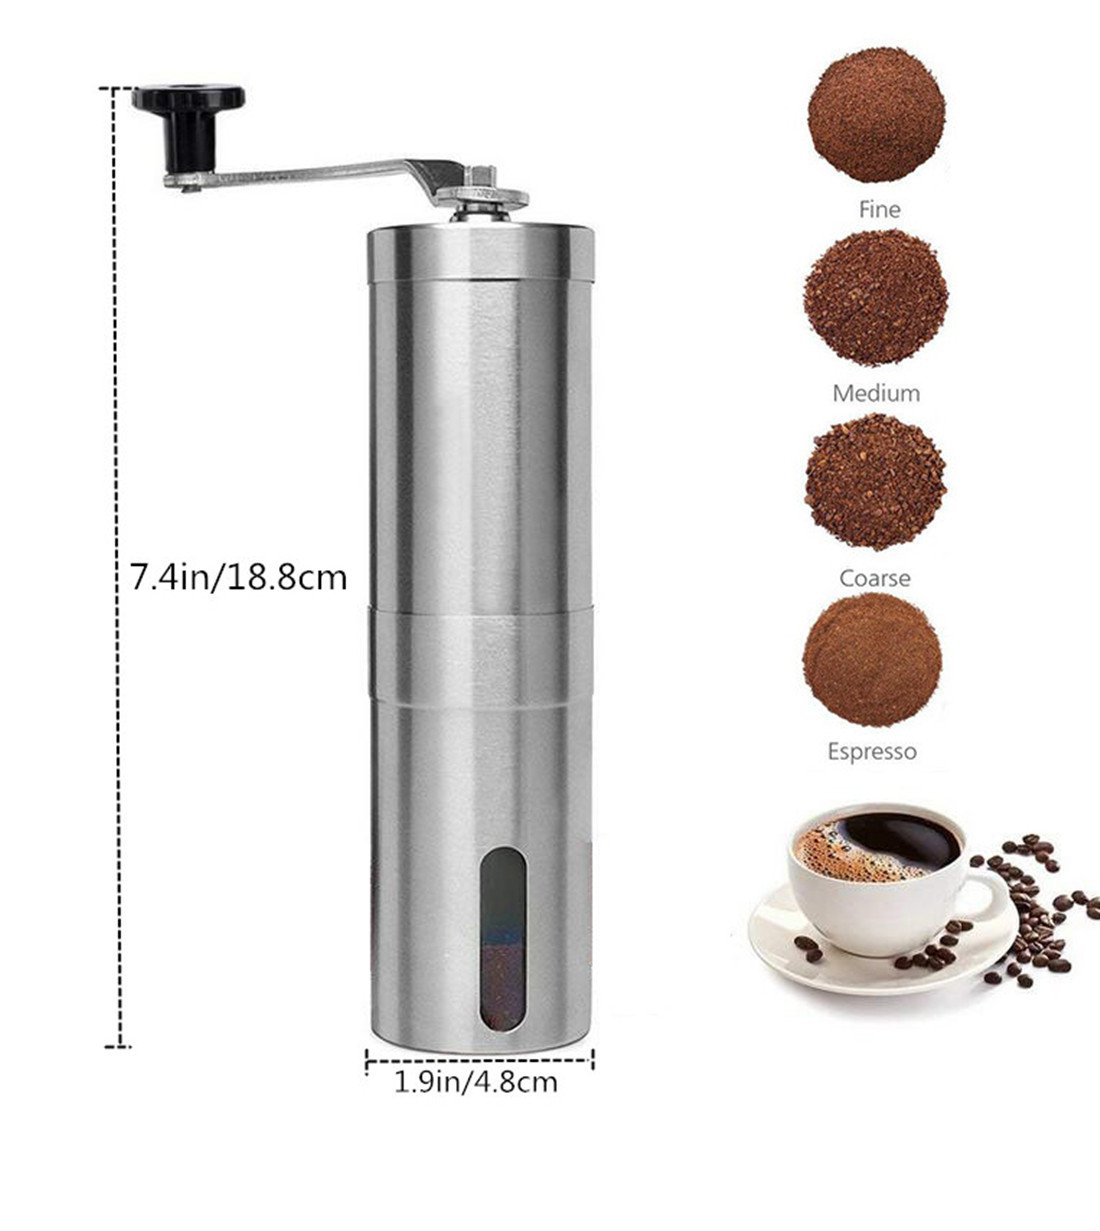 Emwel Whole Bean Manual Coffee Grinder